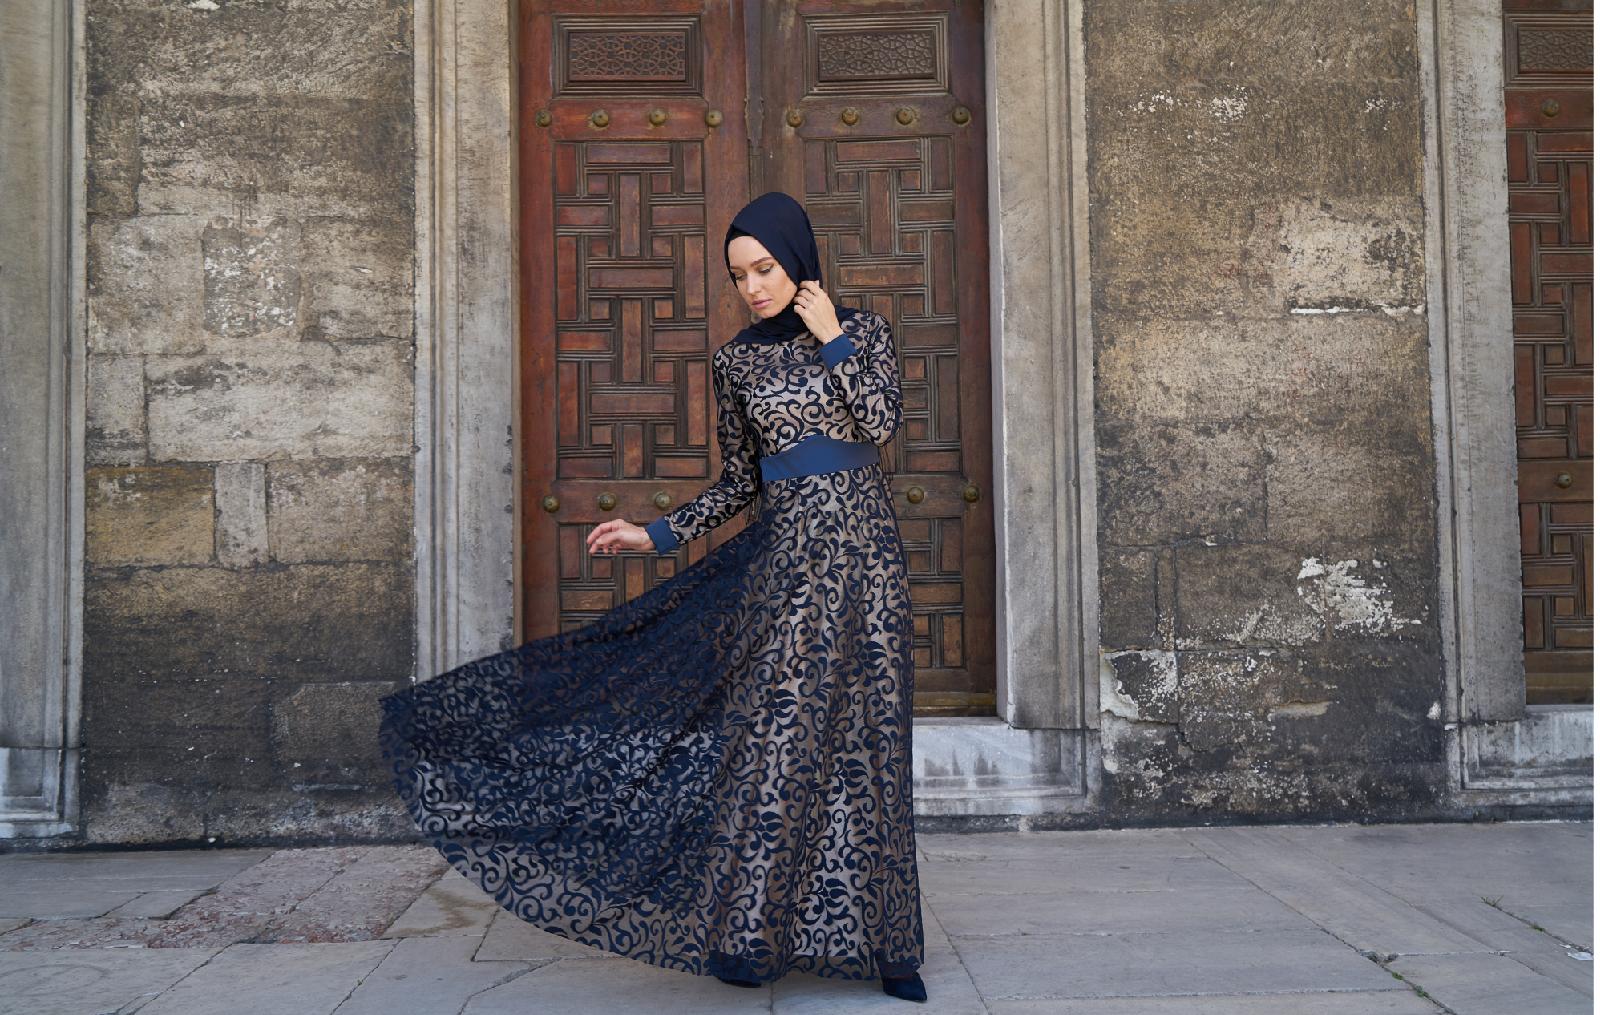 Siapkan Paket Spesial Lebaran karena di bulan Ramadhan customer ingin tampil kece